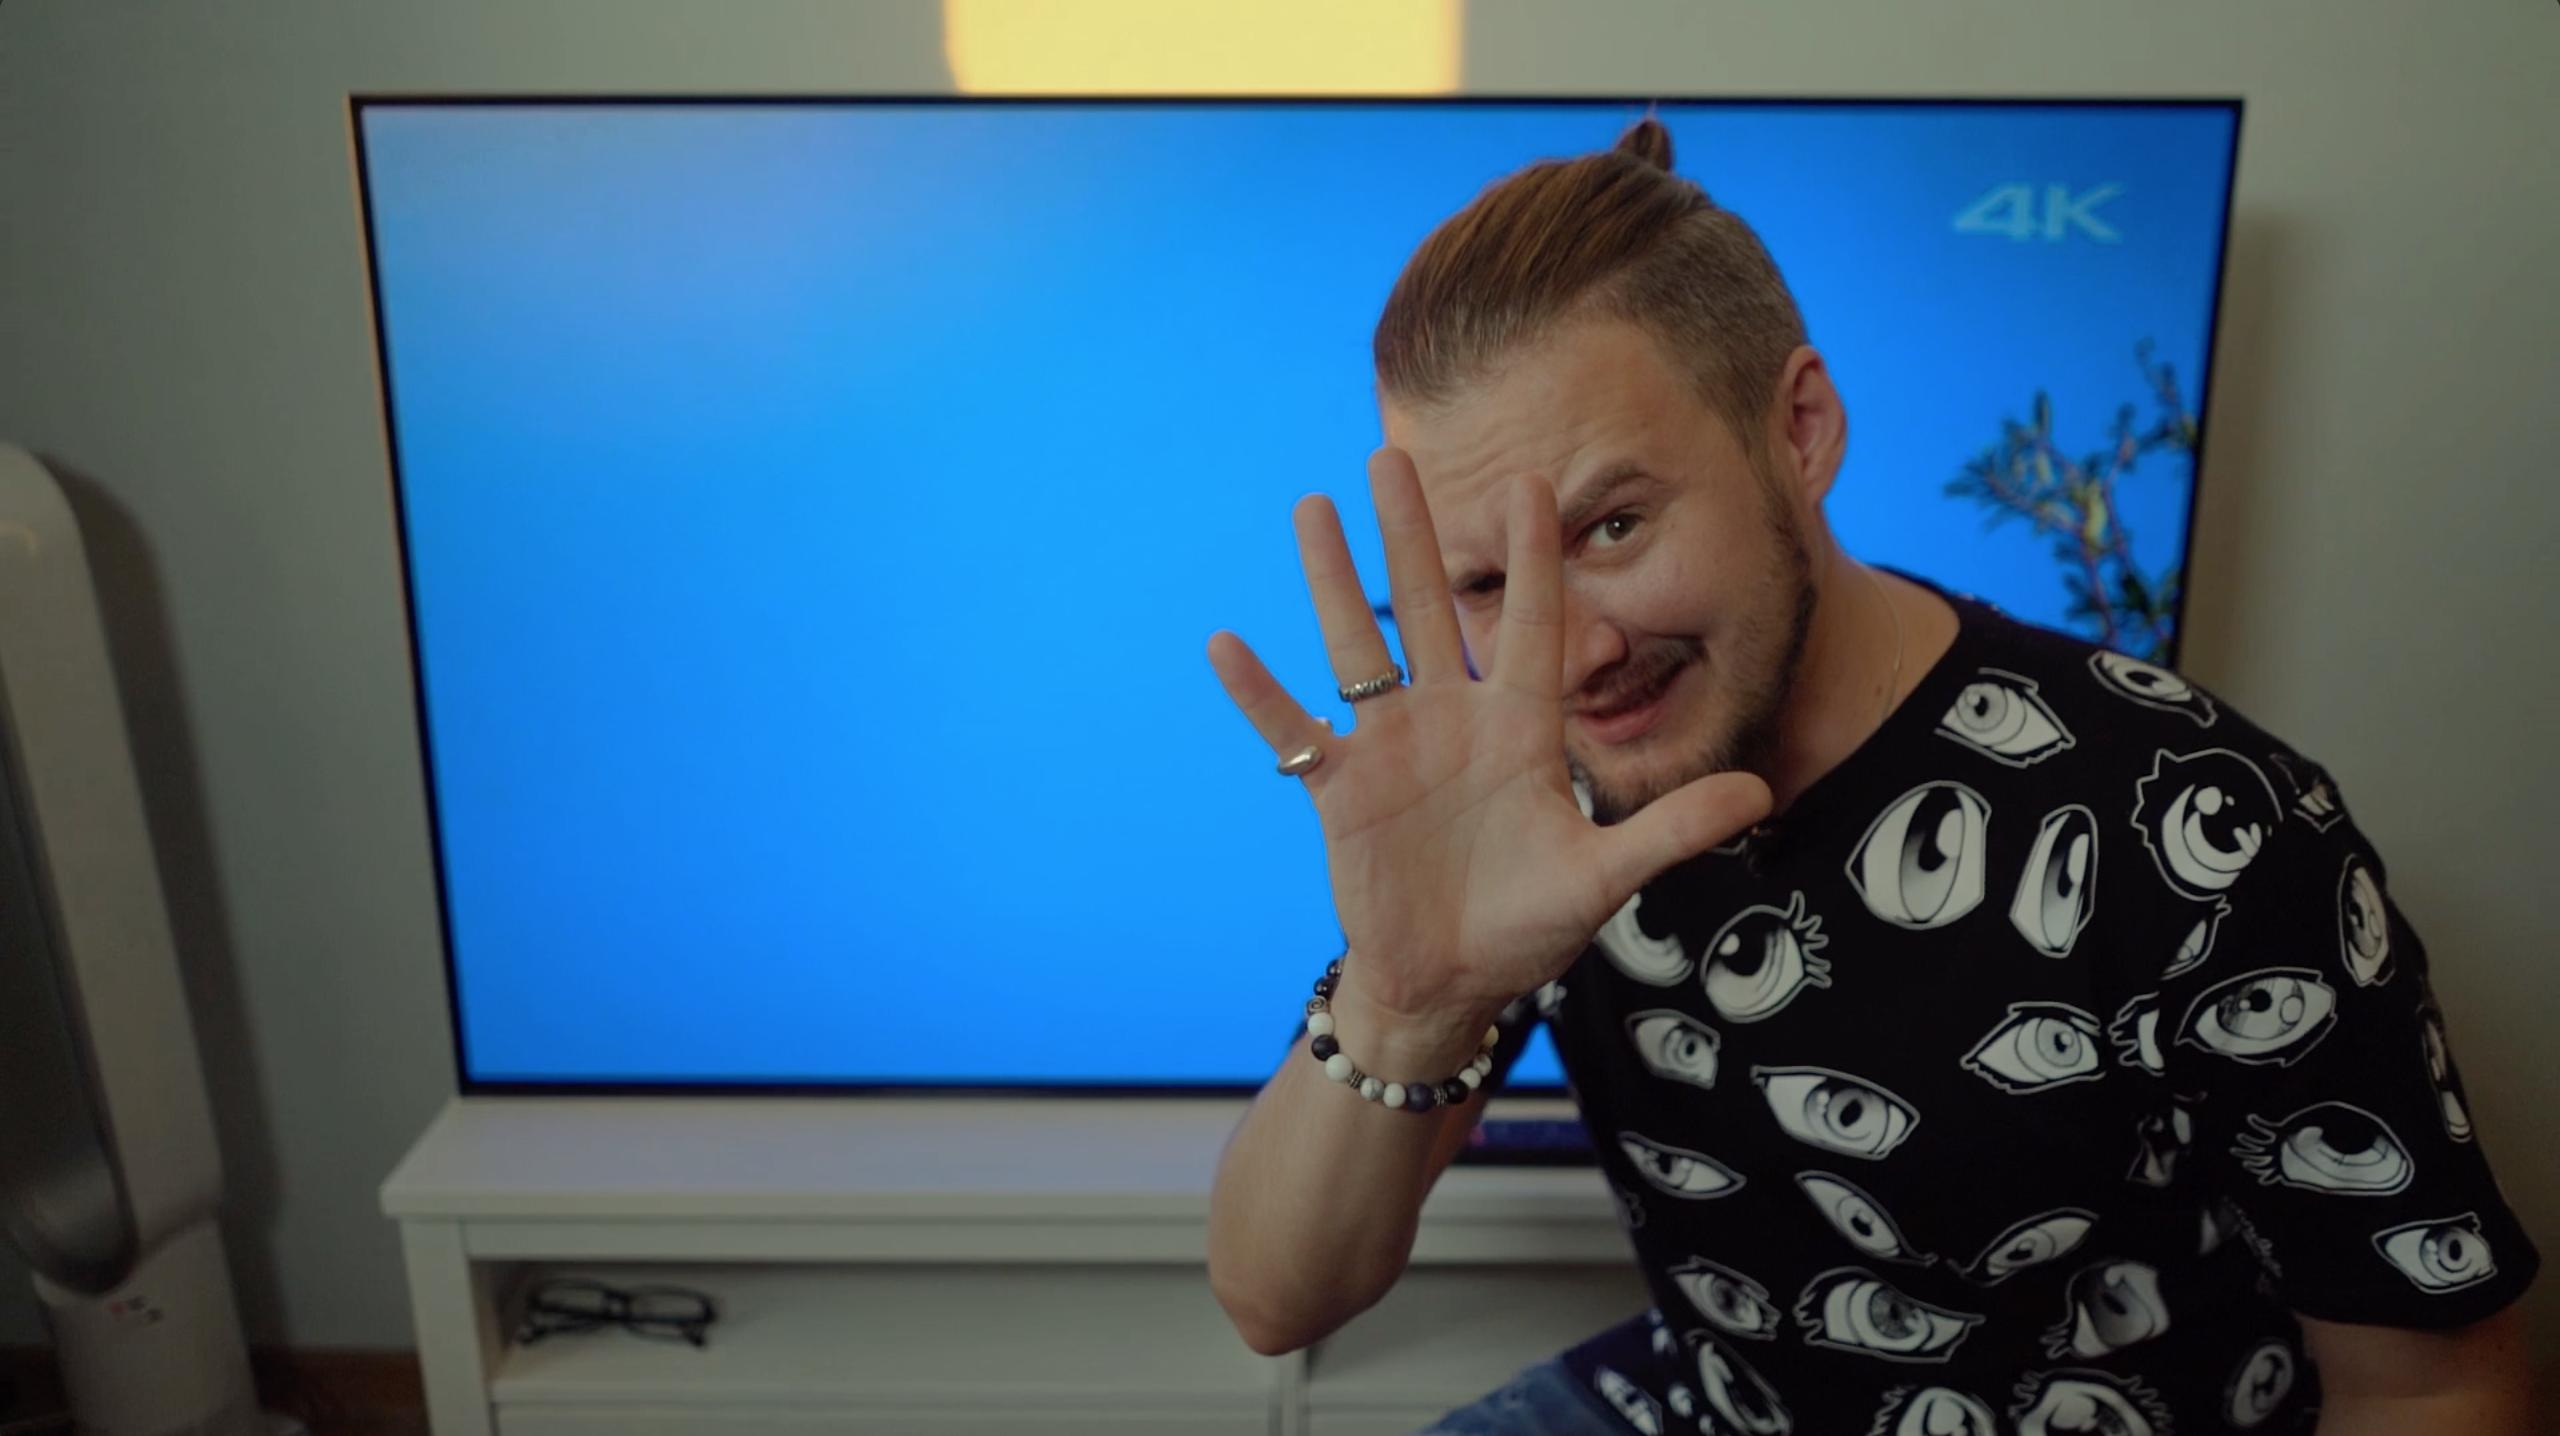 5 уникальных «фишек» OLED-телевизора Sony | Видеообзор